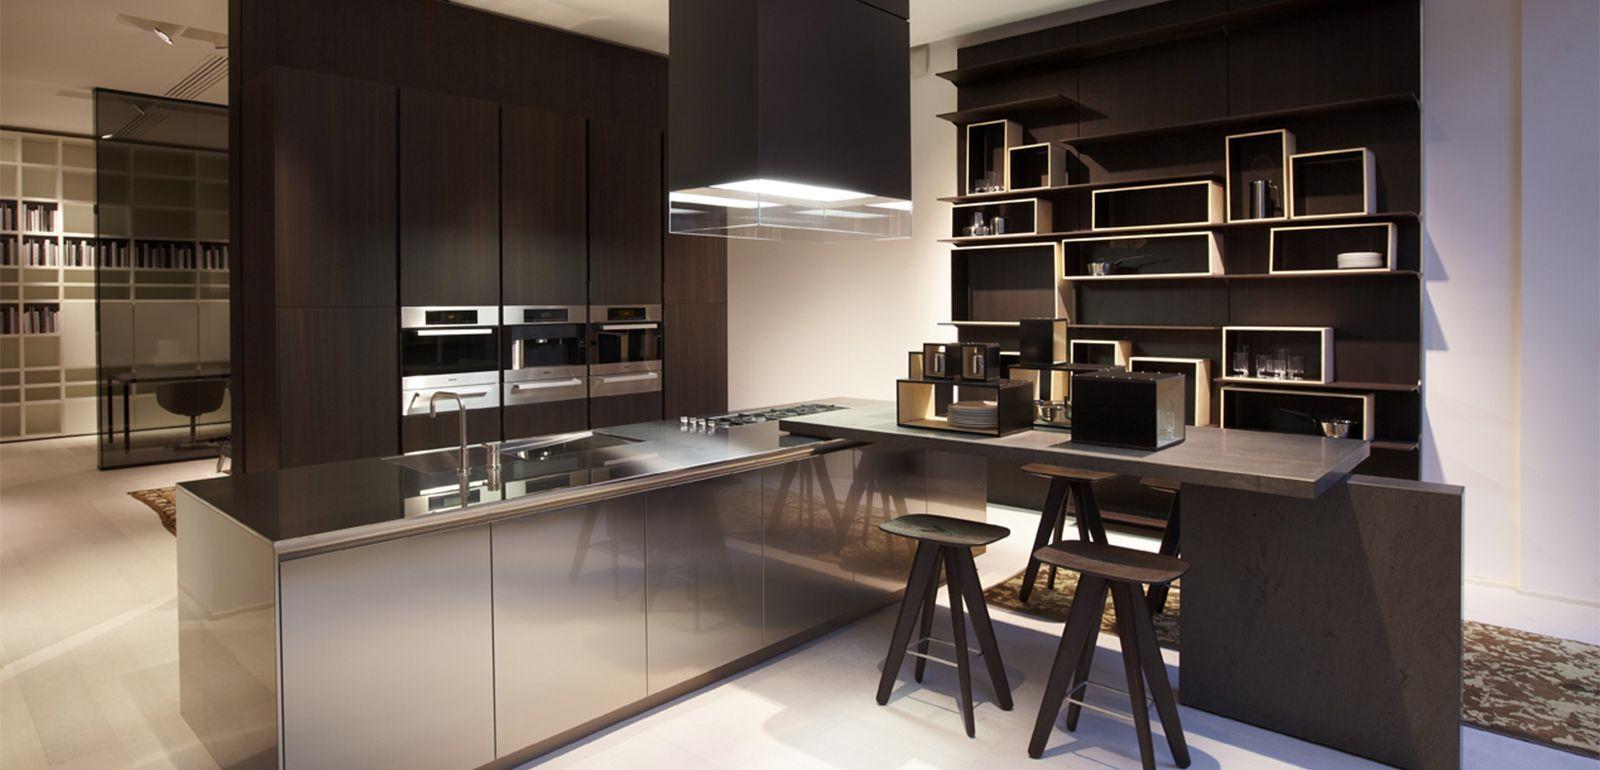 Contemporary Furniture Stores In London And Paris Furniture Shops - Varenna cuisine